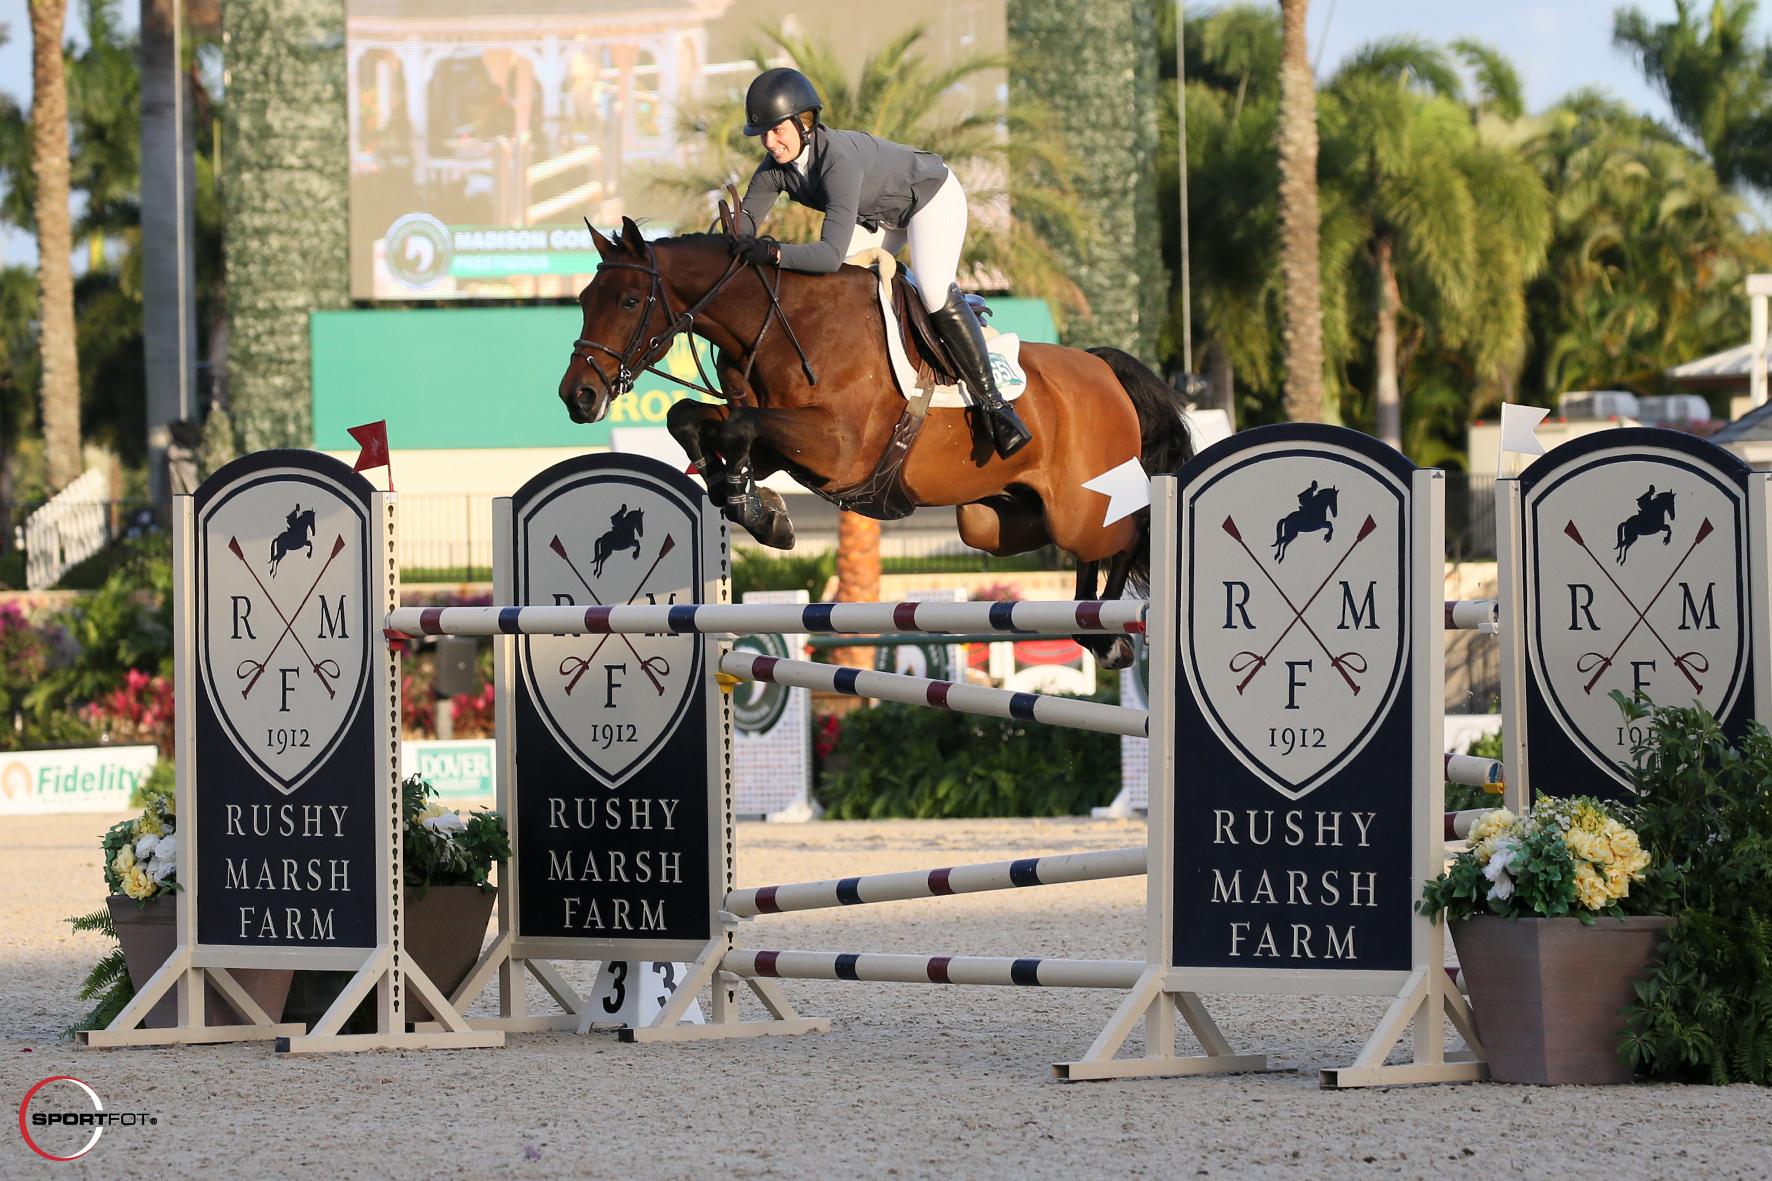 Madison Goetzmann Rises to the Top in Rushy Marsh Farm Grand Prix CSI2*